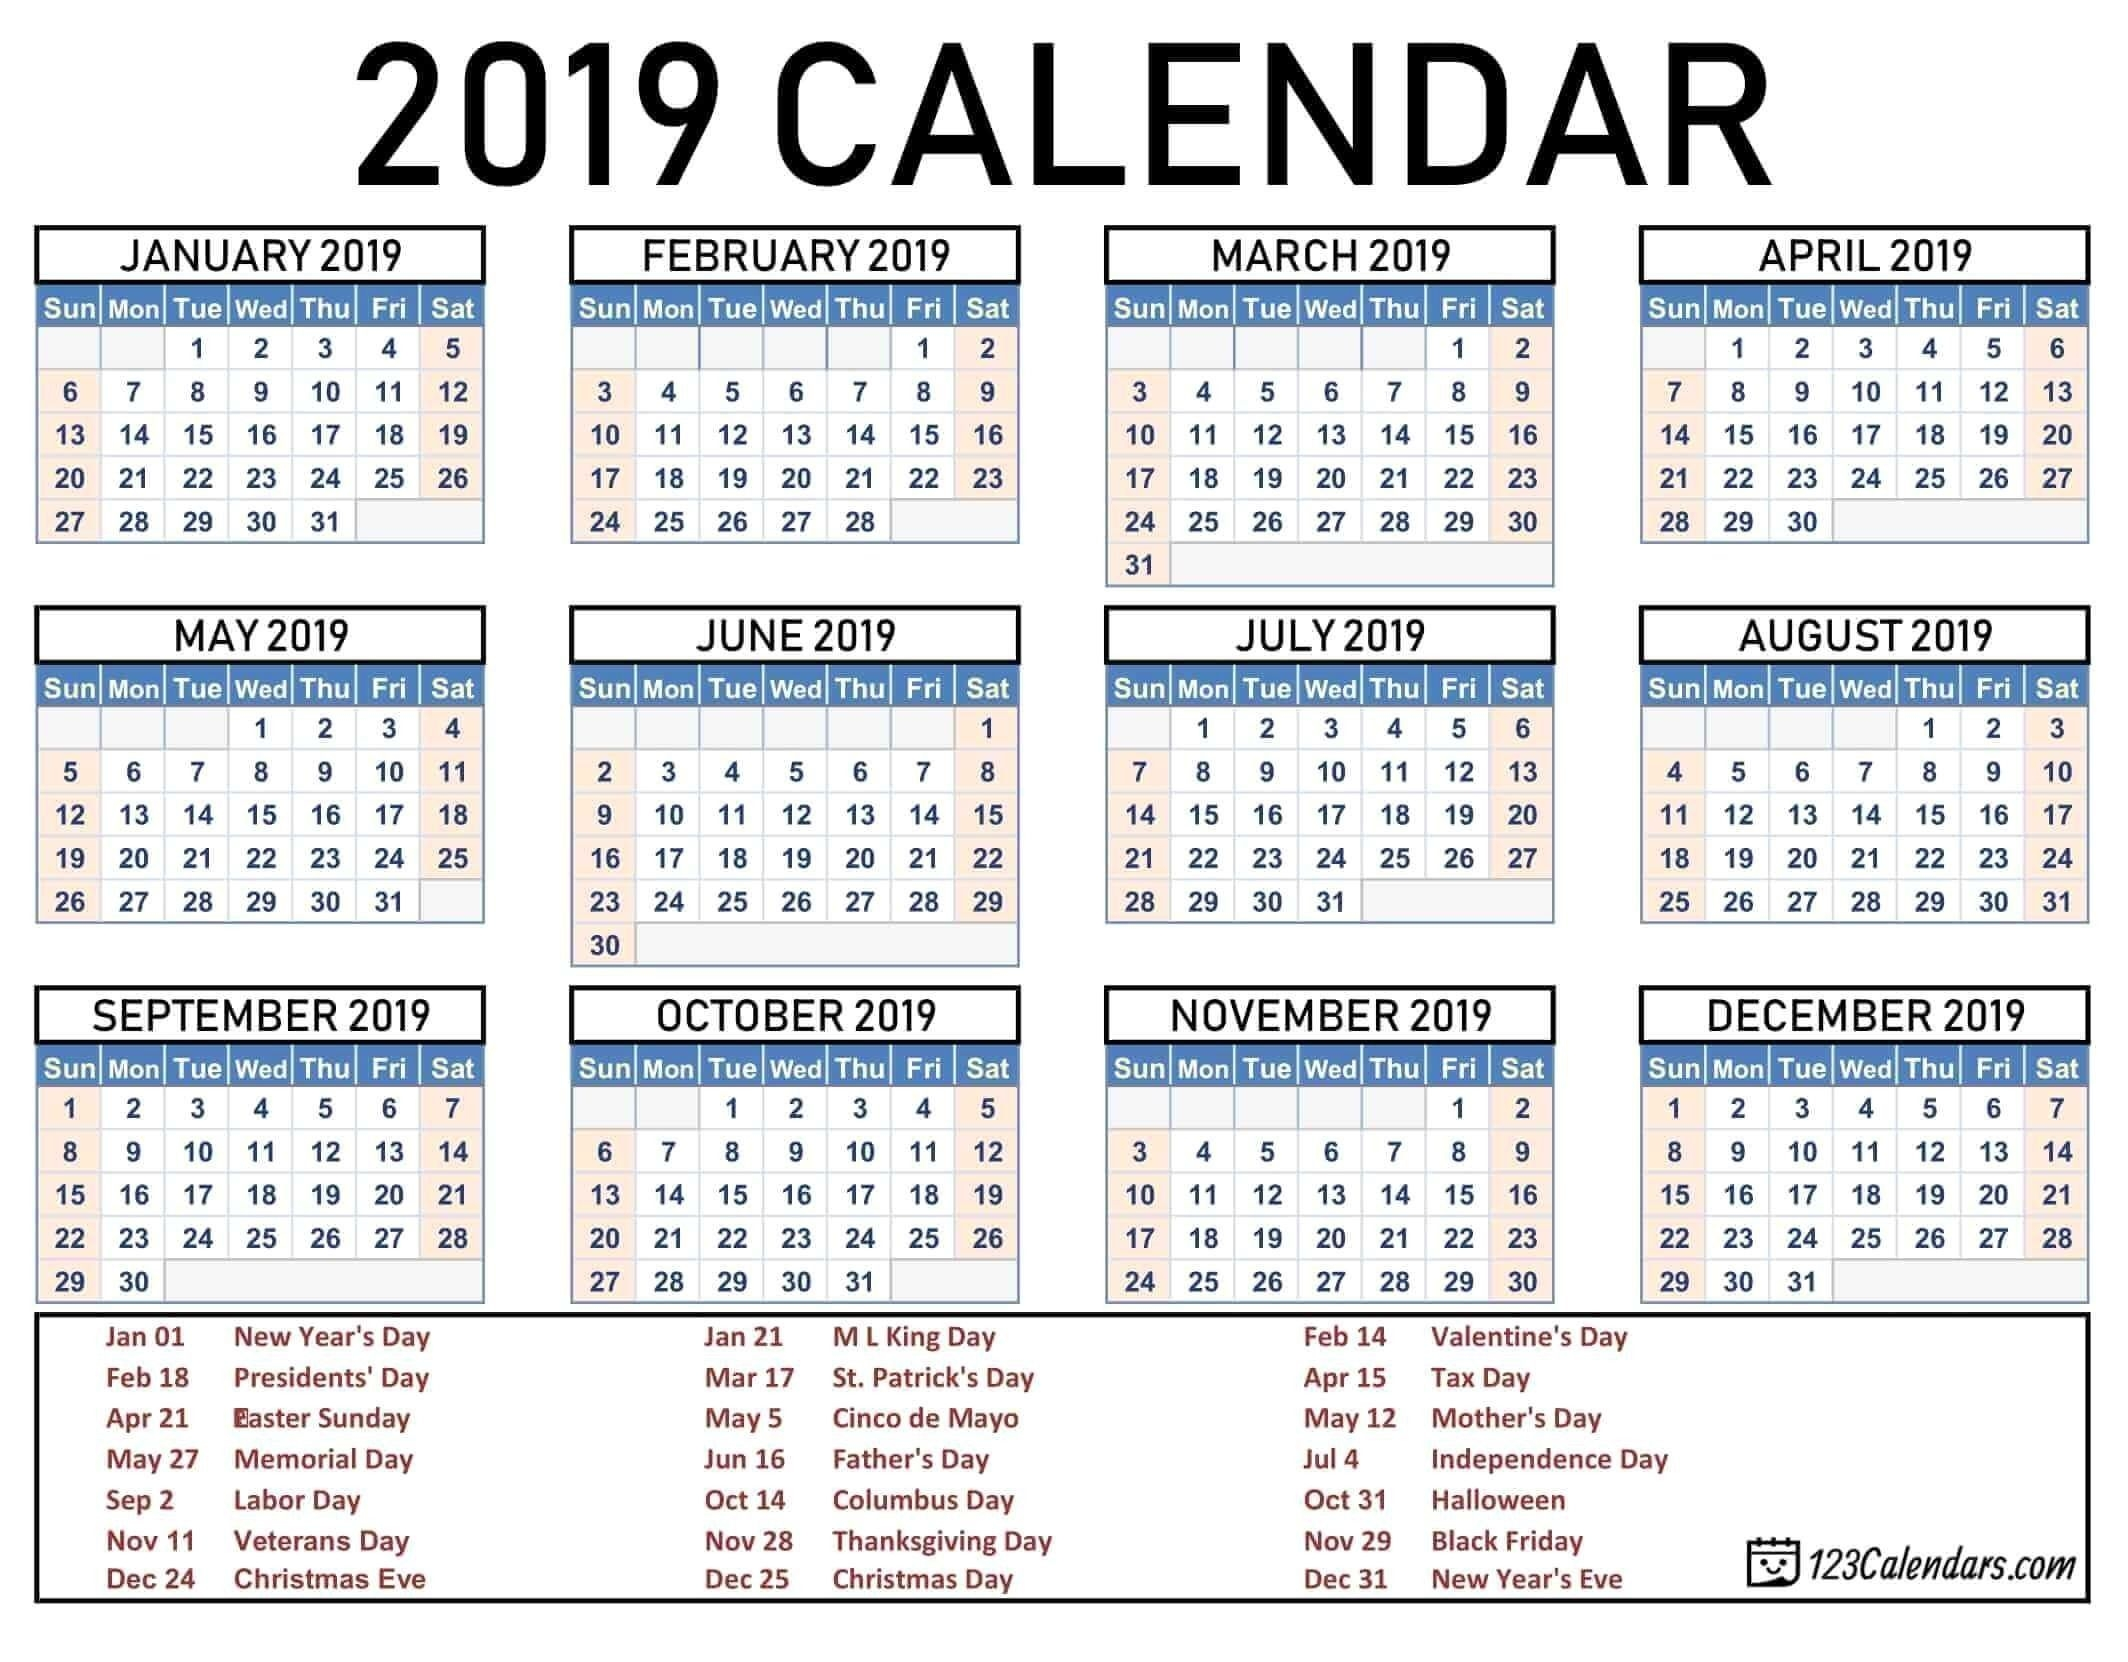 2020 Calendar With Public Holidays And School Holidays